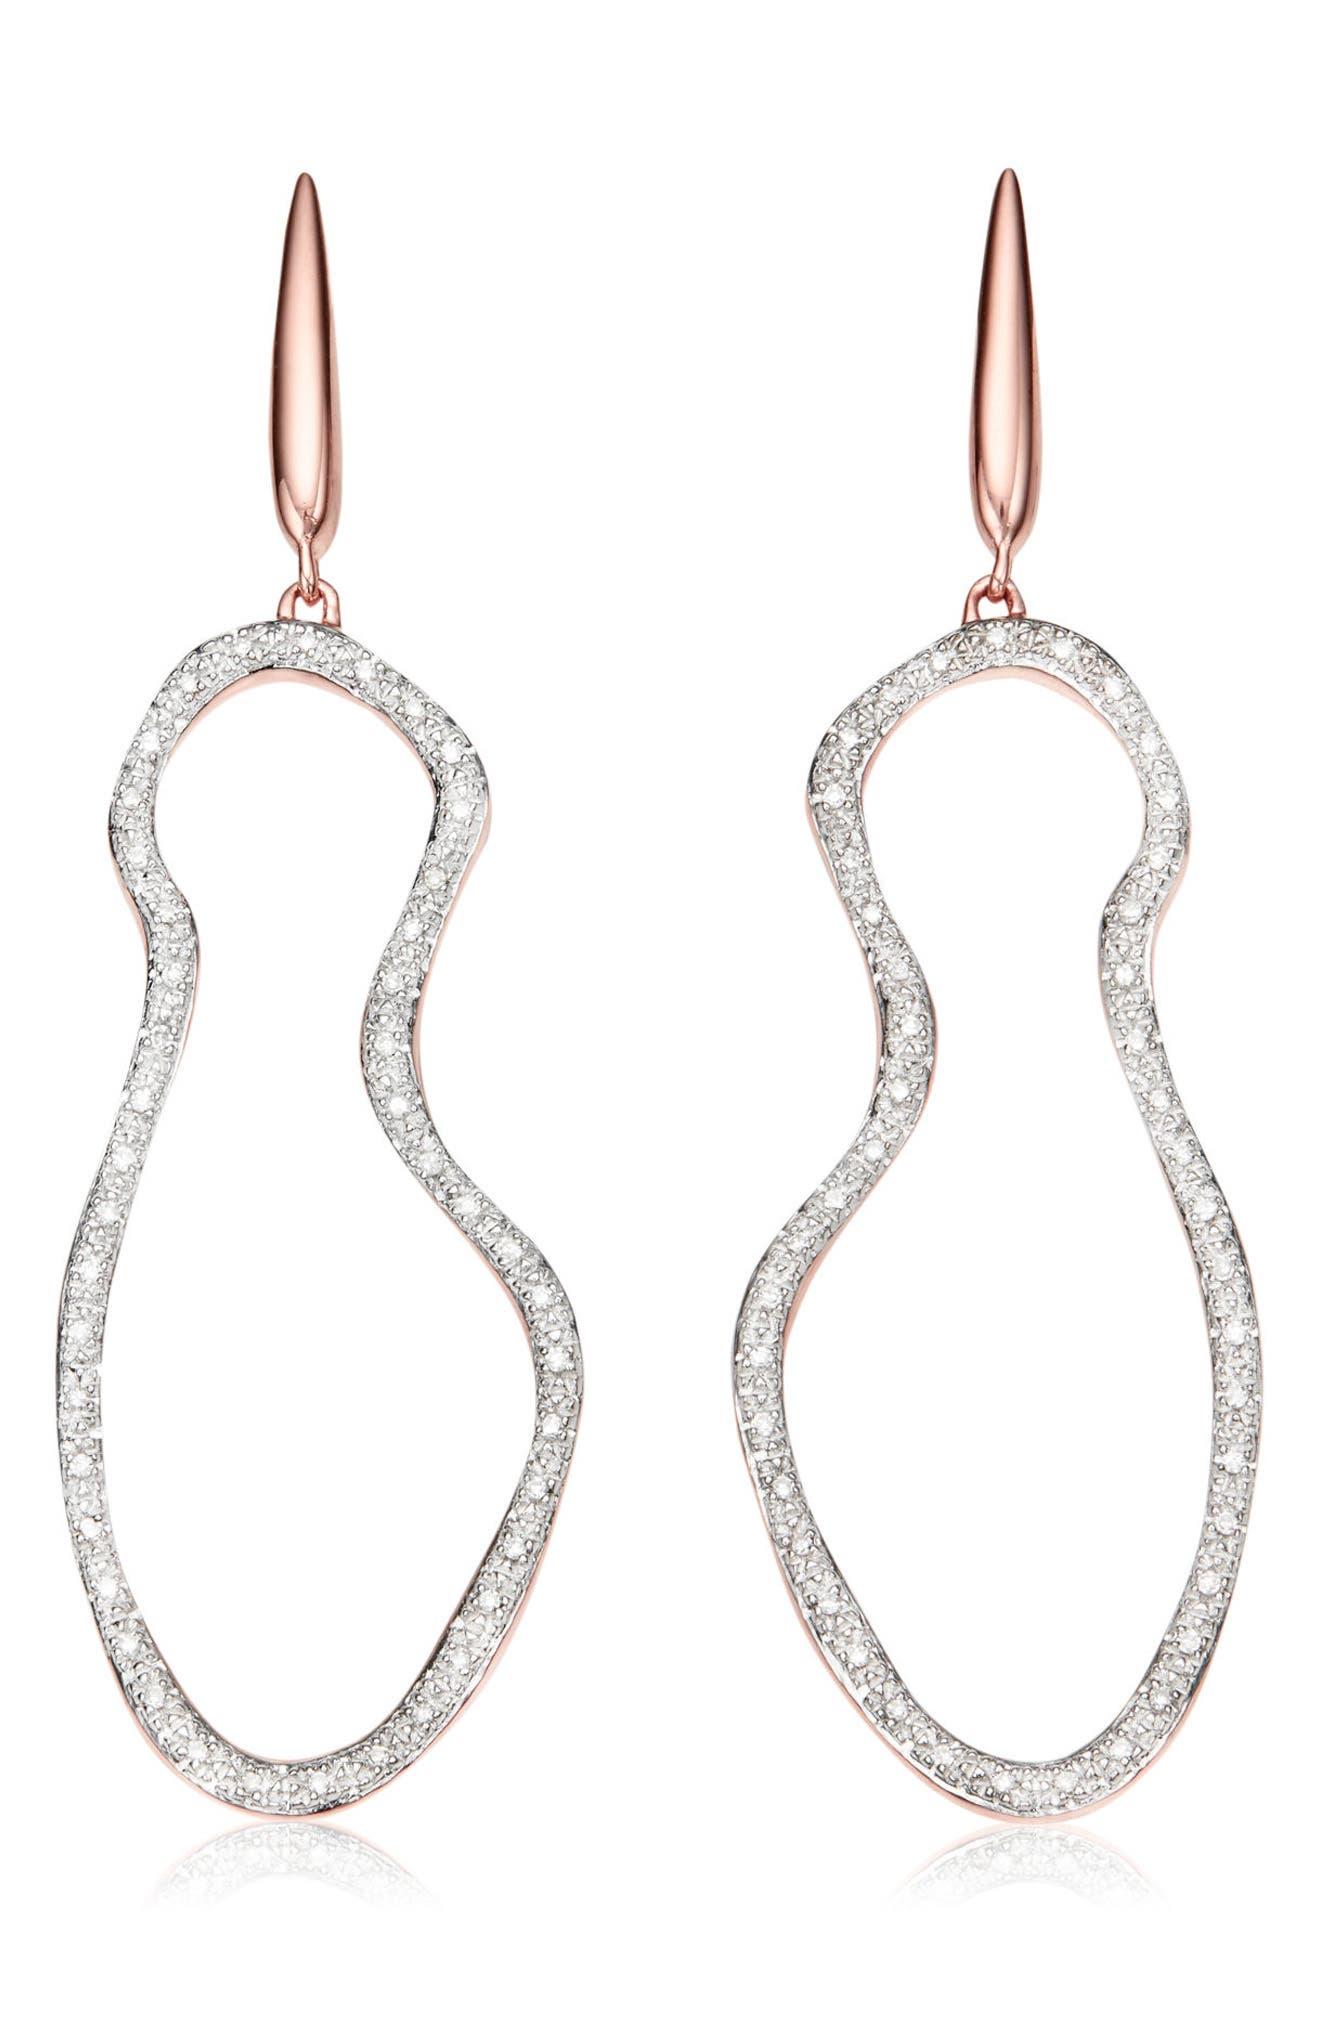 Riva Diamond Drop Earrings,                             Main thumbnail 1, color,                             710